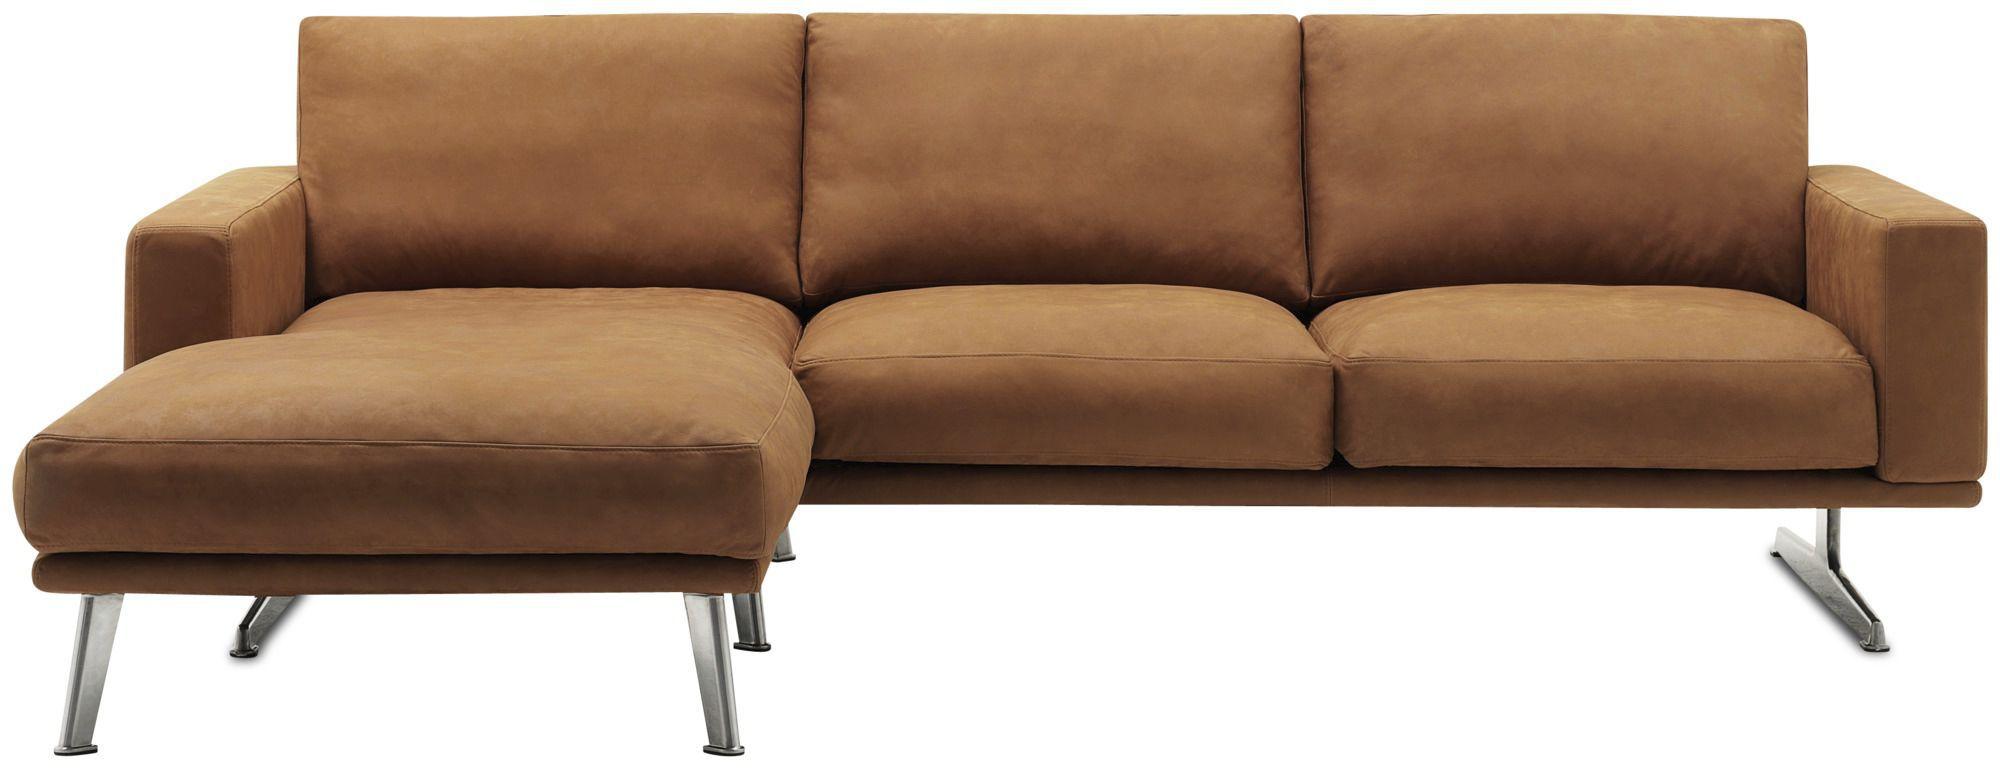 ... Corner Sofa / Modular / Contemporary / Leather CARLTON By Anders  Nørgaard BoConcept